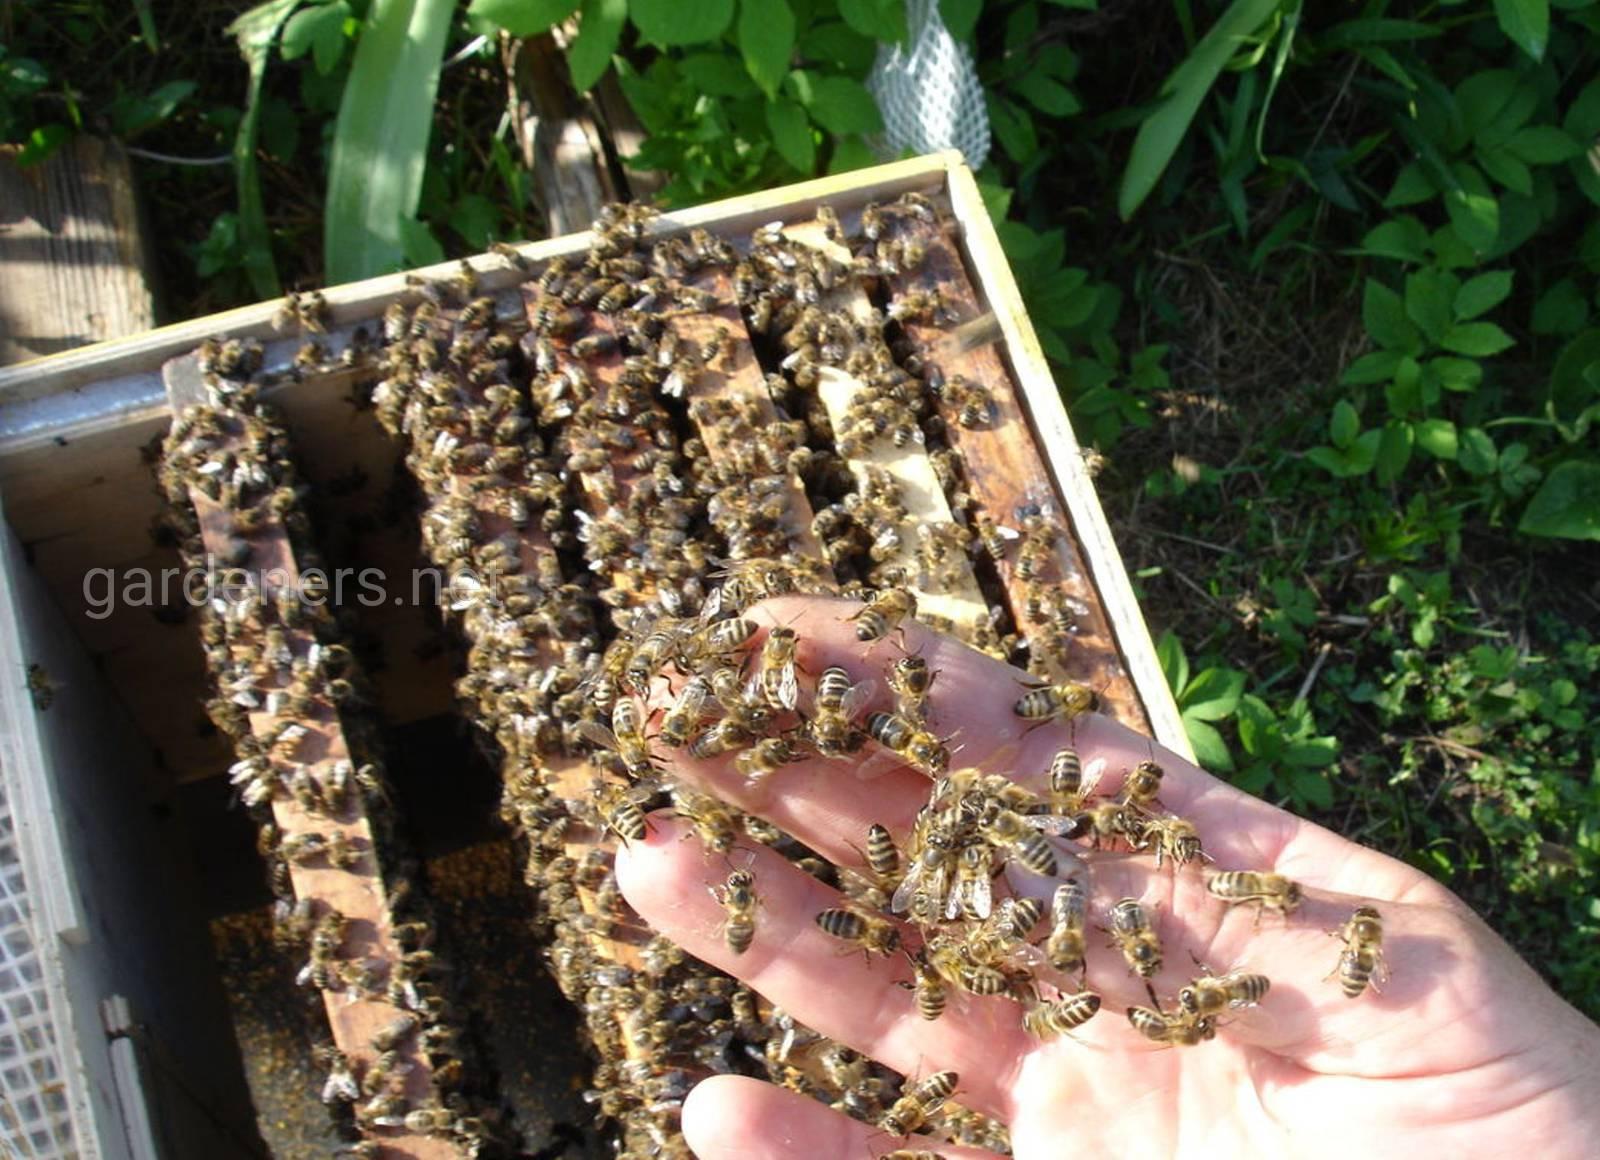 семья пчел.jpg